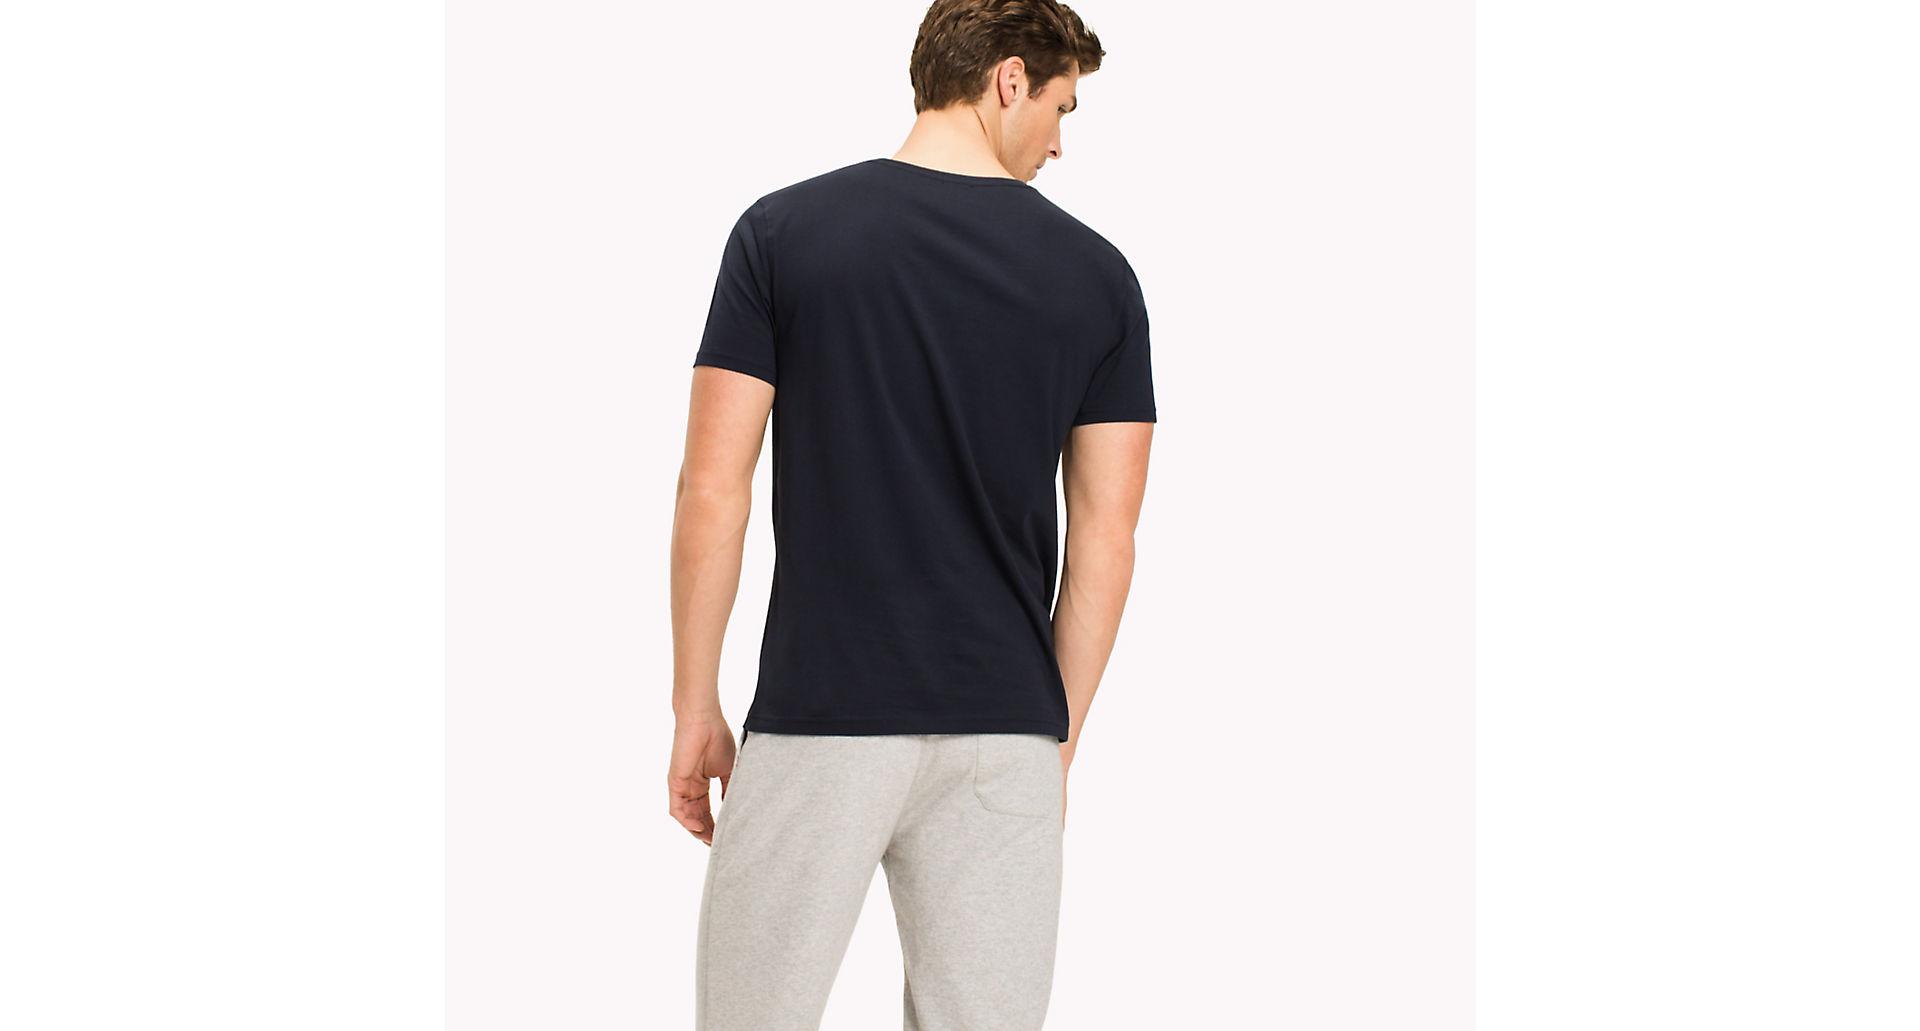 Tommy-Hilfiger-Para-Hombre-Camiseta-de-manga-corta-icono-034-034 miniatura 4